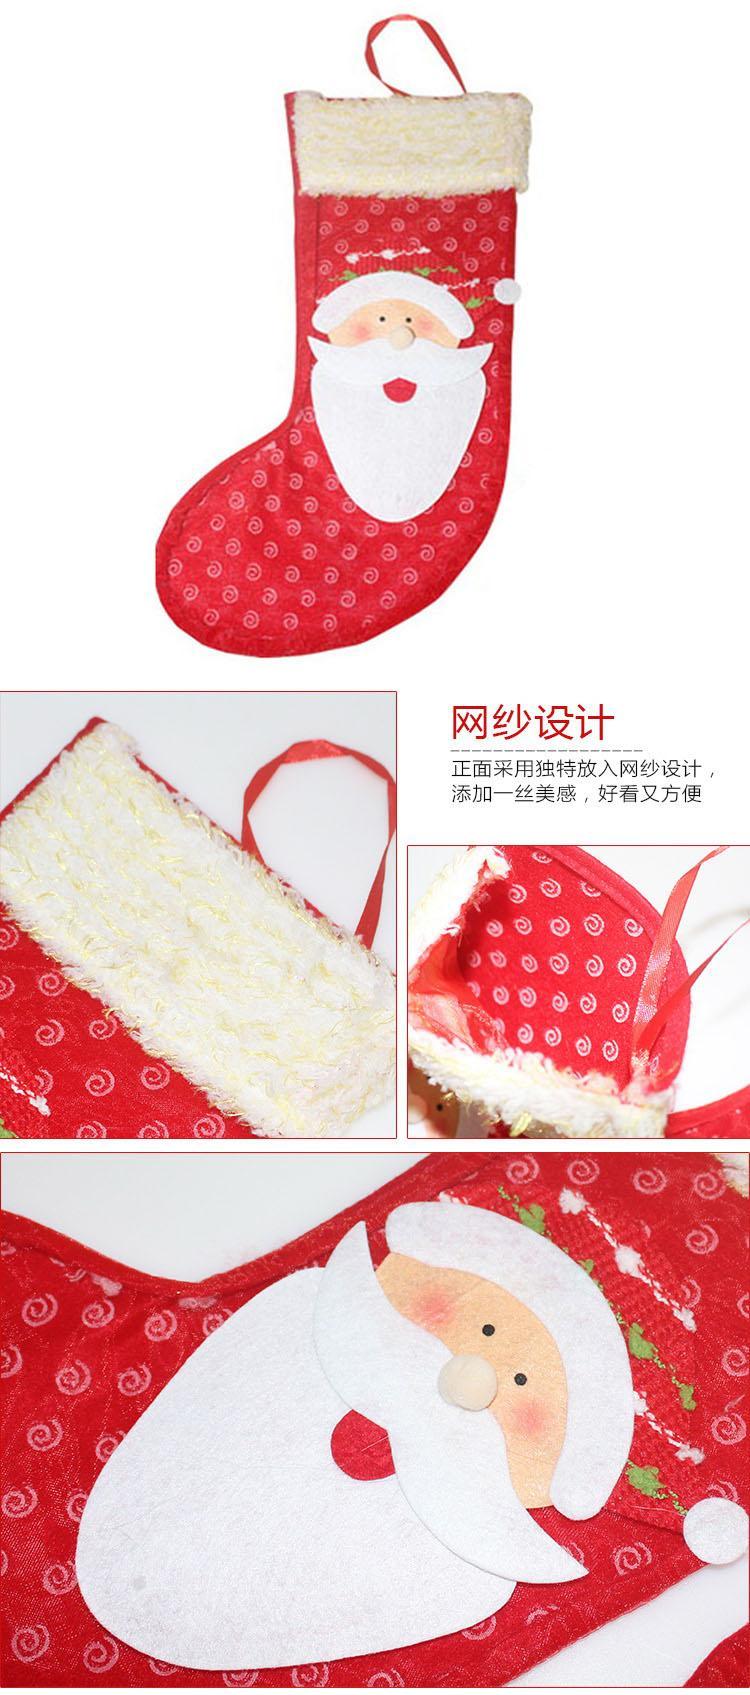 candy bags christmas socks decoration velvet gloves socks colorful whlolesale new style 024 best quanlity nice gifts